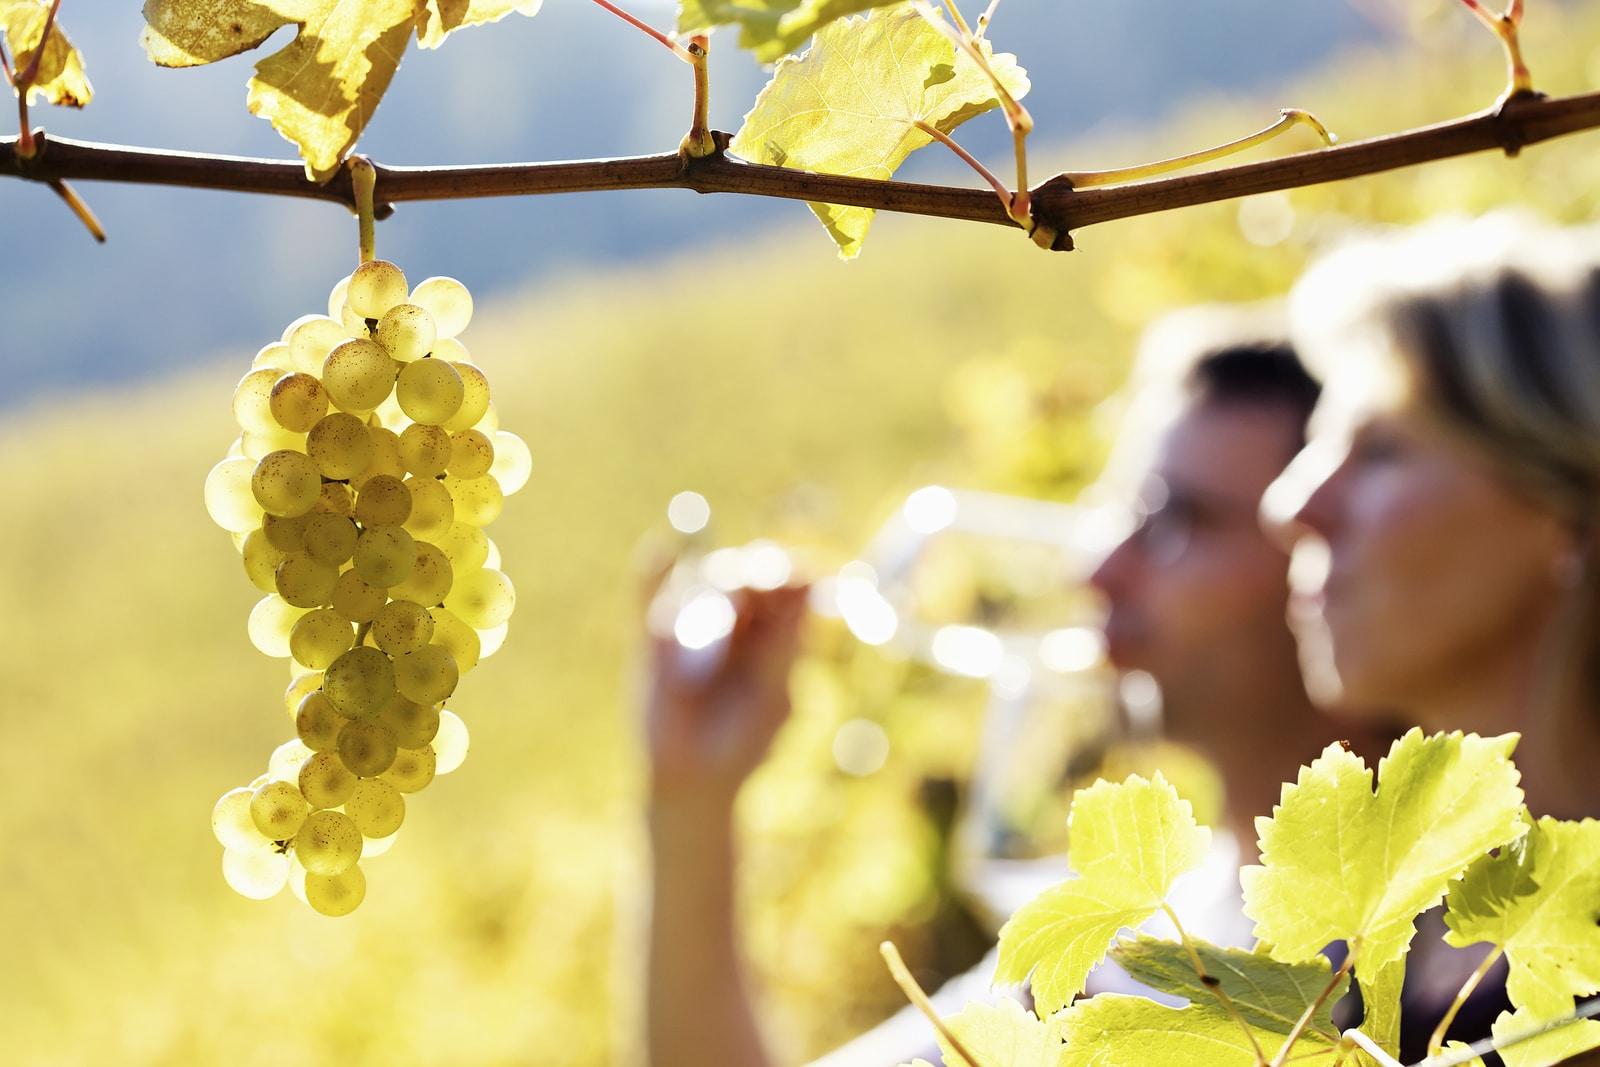 Visit Bainbridge Island Wineries This Summer